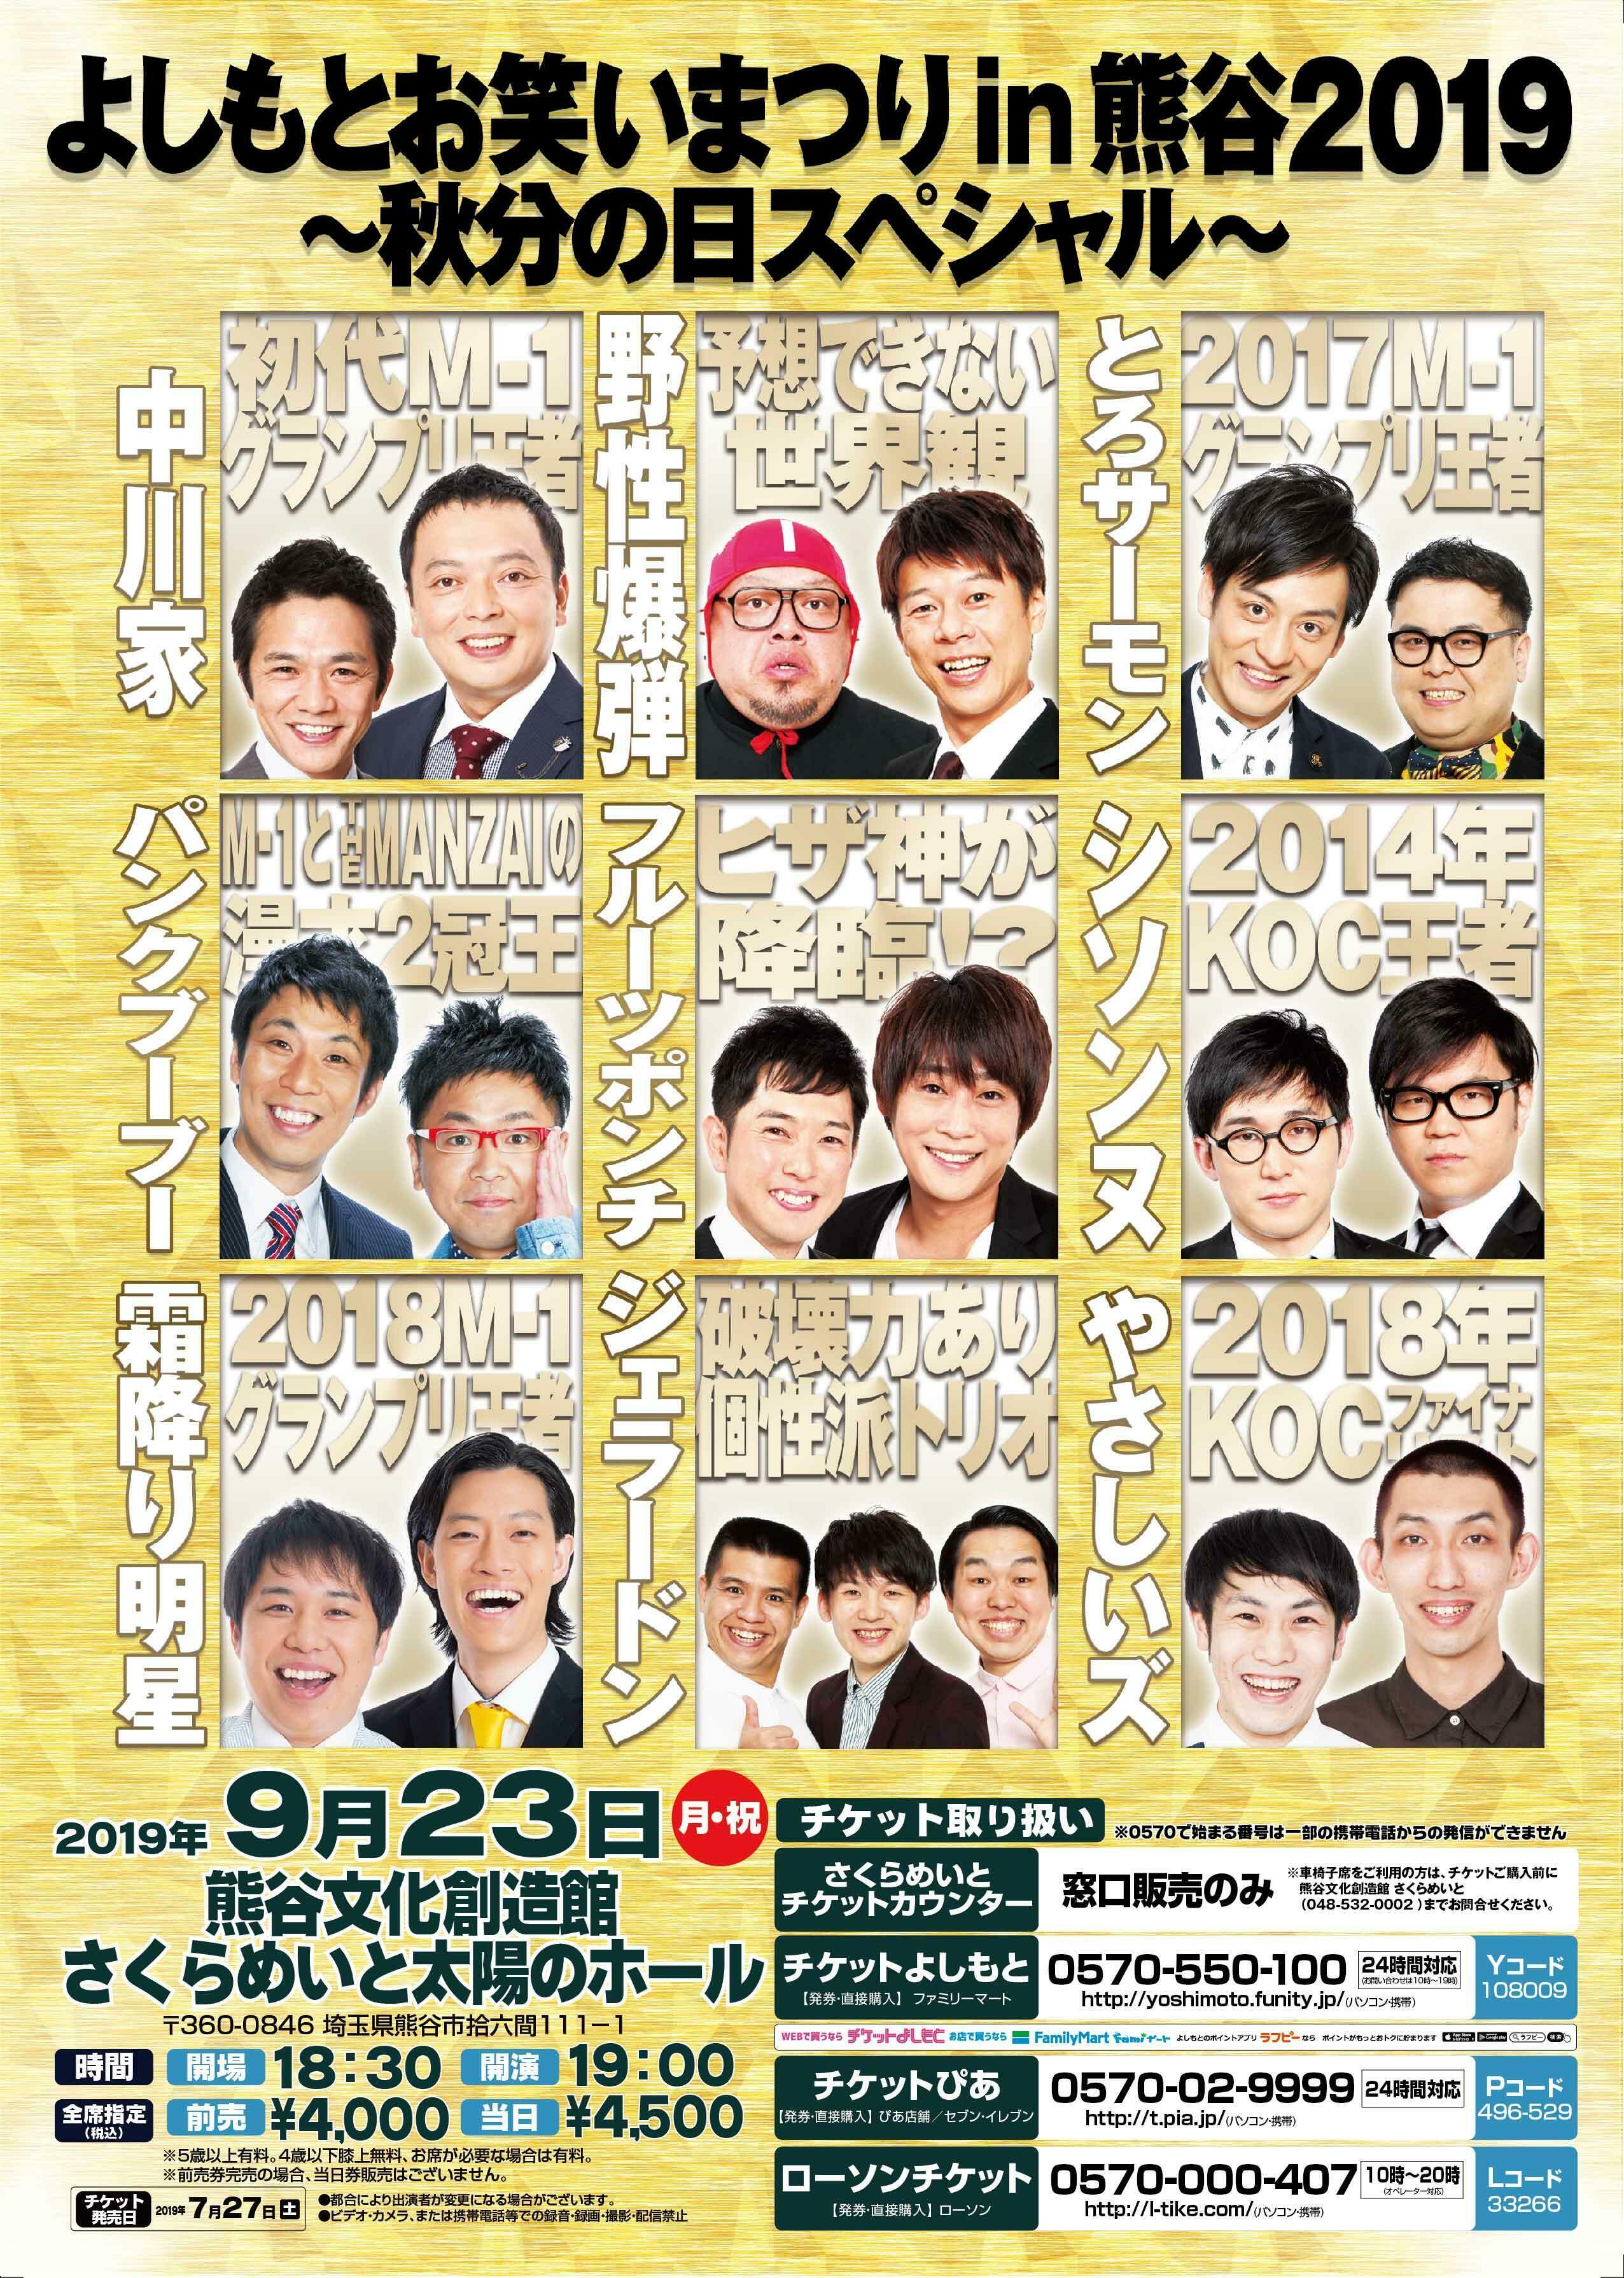 http://www.syumatsu.jp/20190909130518-b8edd96063ec4abfebf58fe1de5b6e5fcd19b15e.jpg